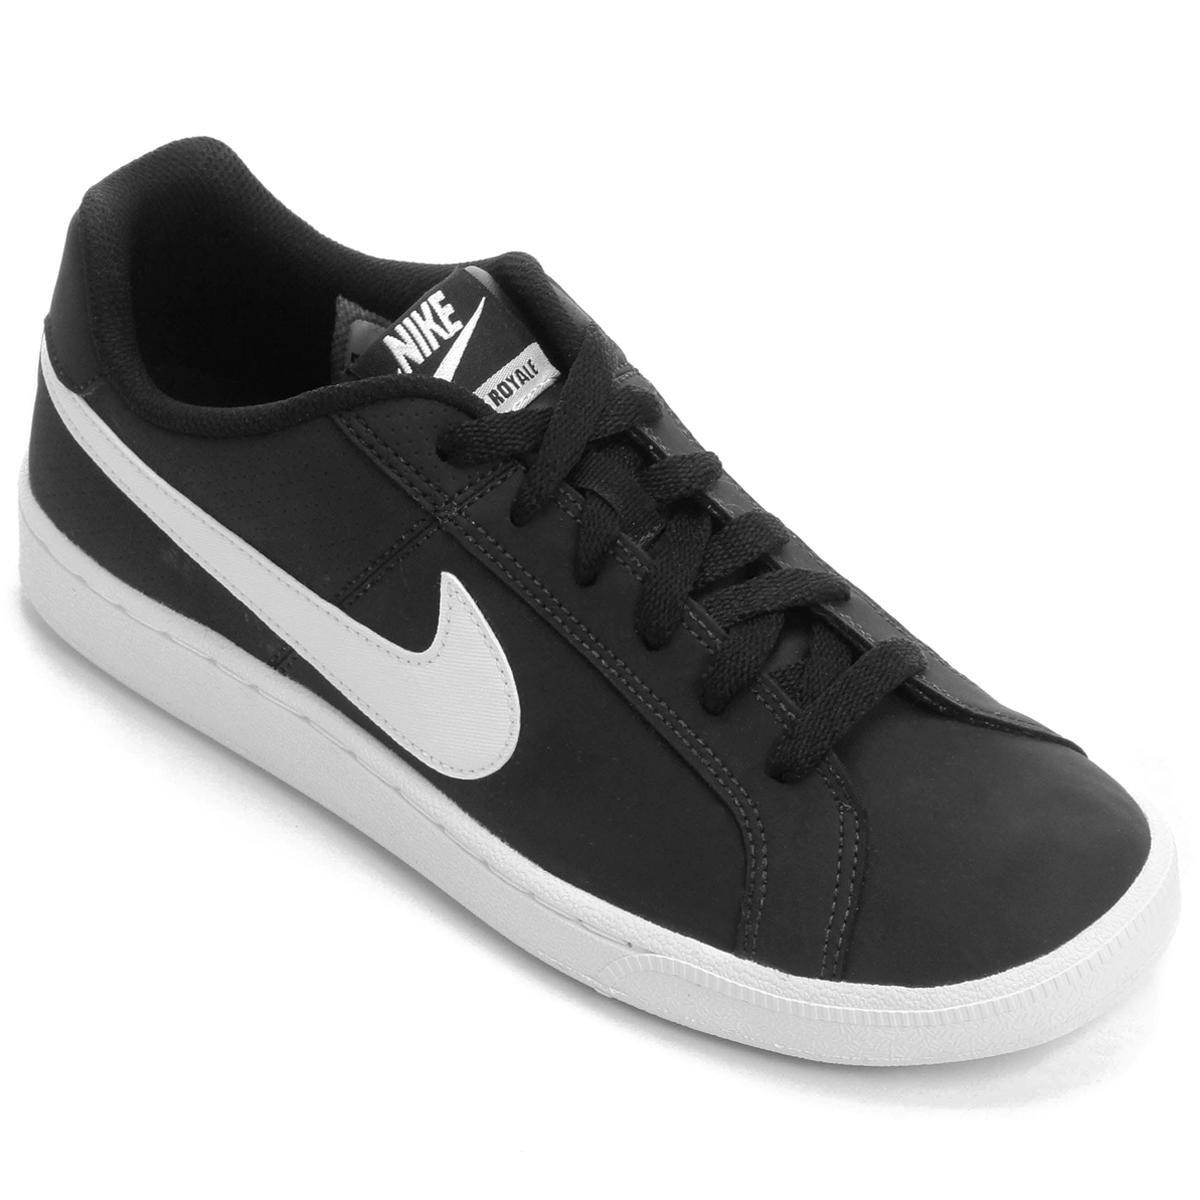 Tênis Couro Nike Court Royale Feminino - Branco e Preto - Compre ... 5f64e194165c3